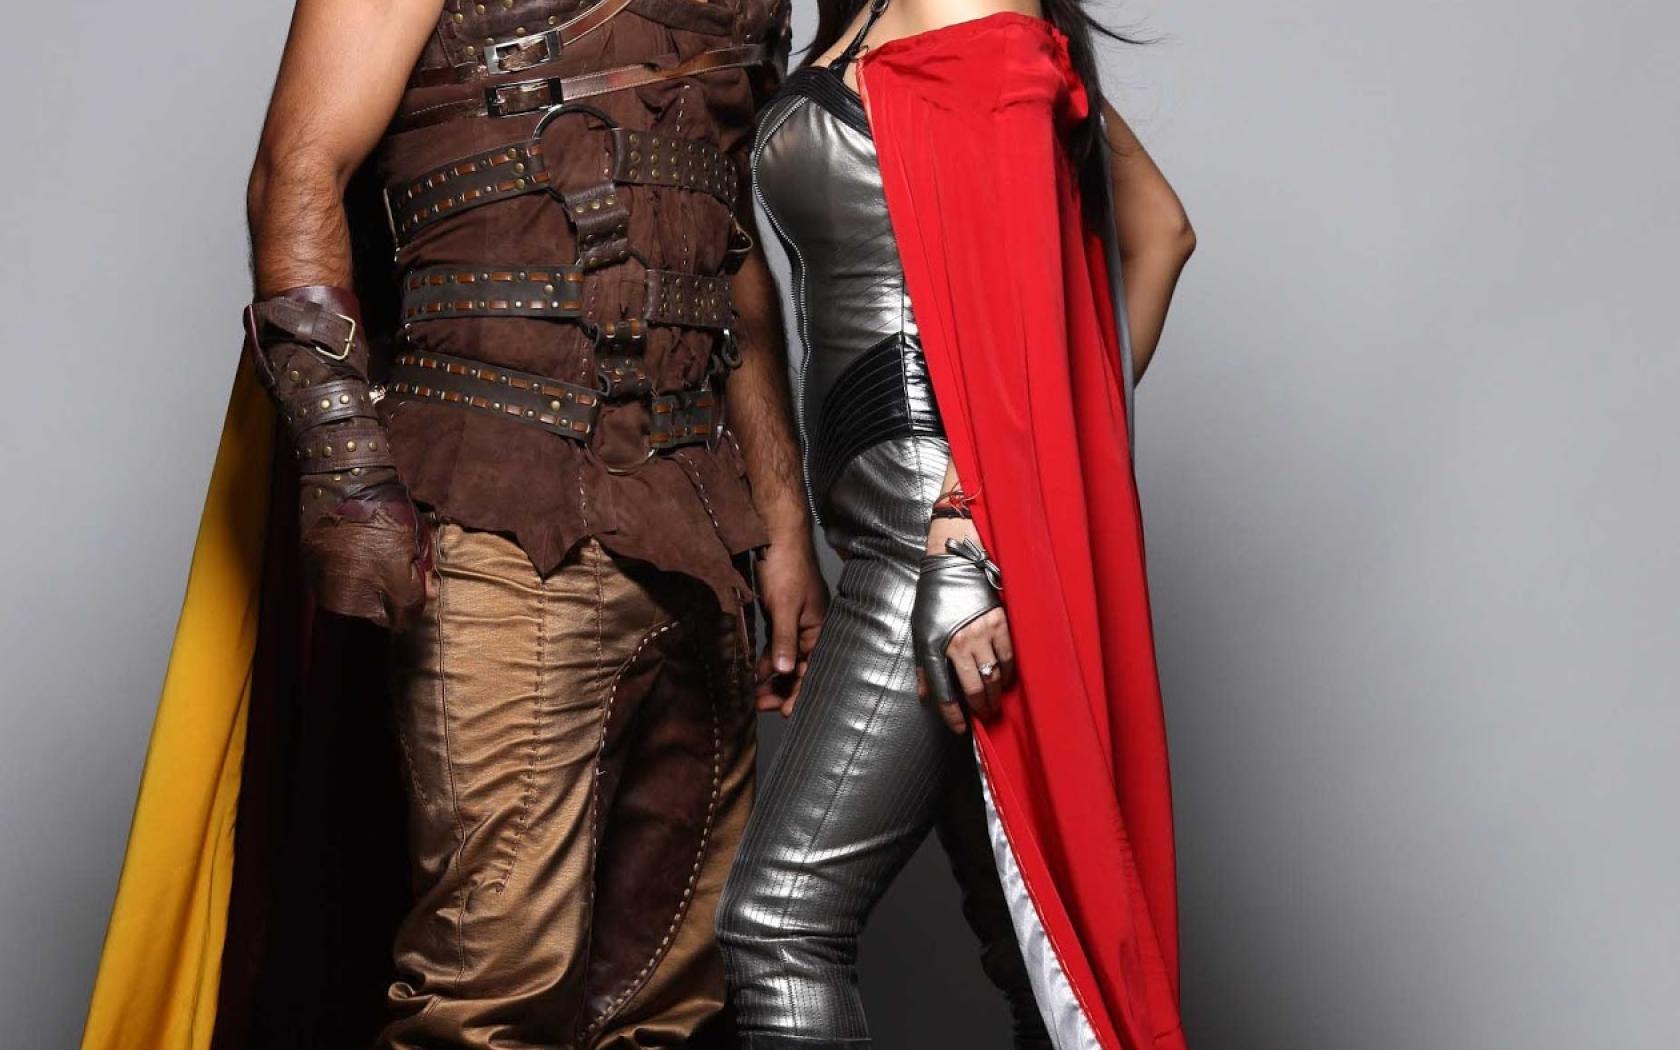 Preity Zinta With Ms Dhoni Photoshoot Hd Wallpaper